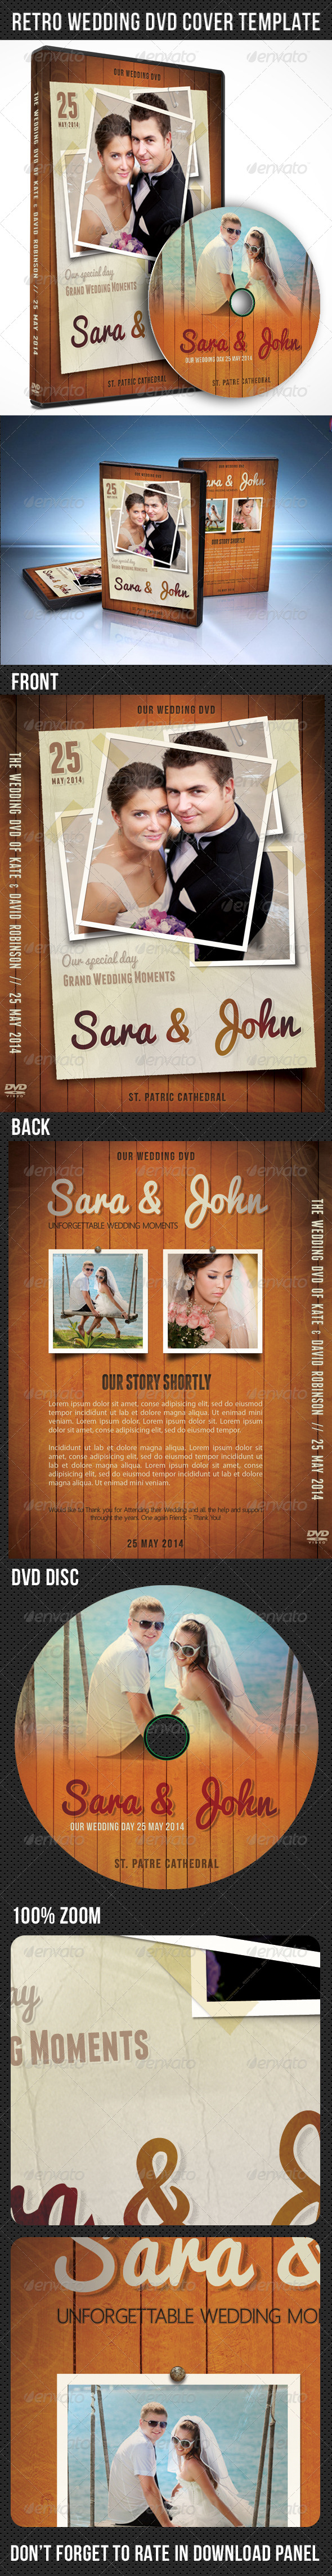 GraphicRiver Retro Wedding DVD Cover Template 02 7459048